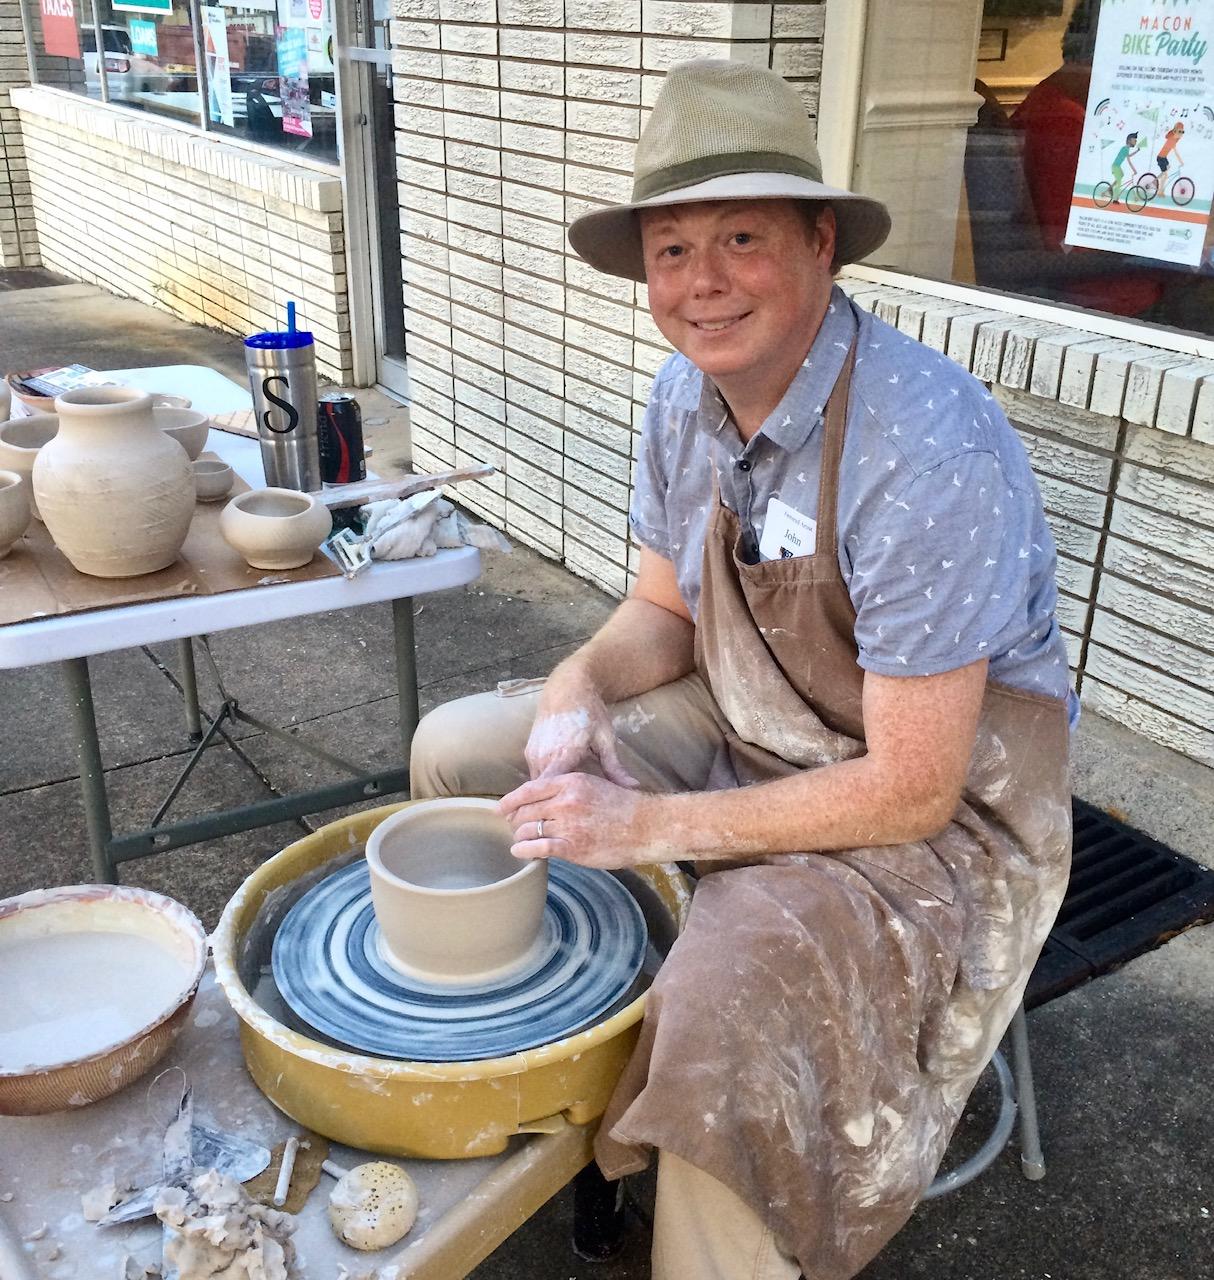 John Skelton gives a pottery wheel demonstration outside The 567.